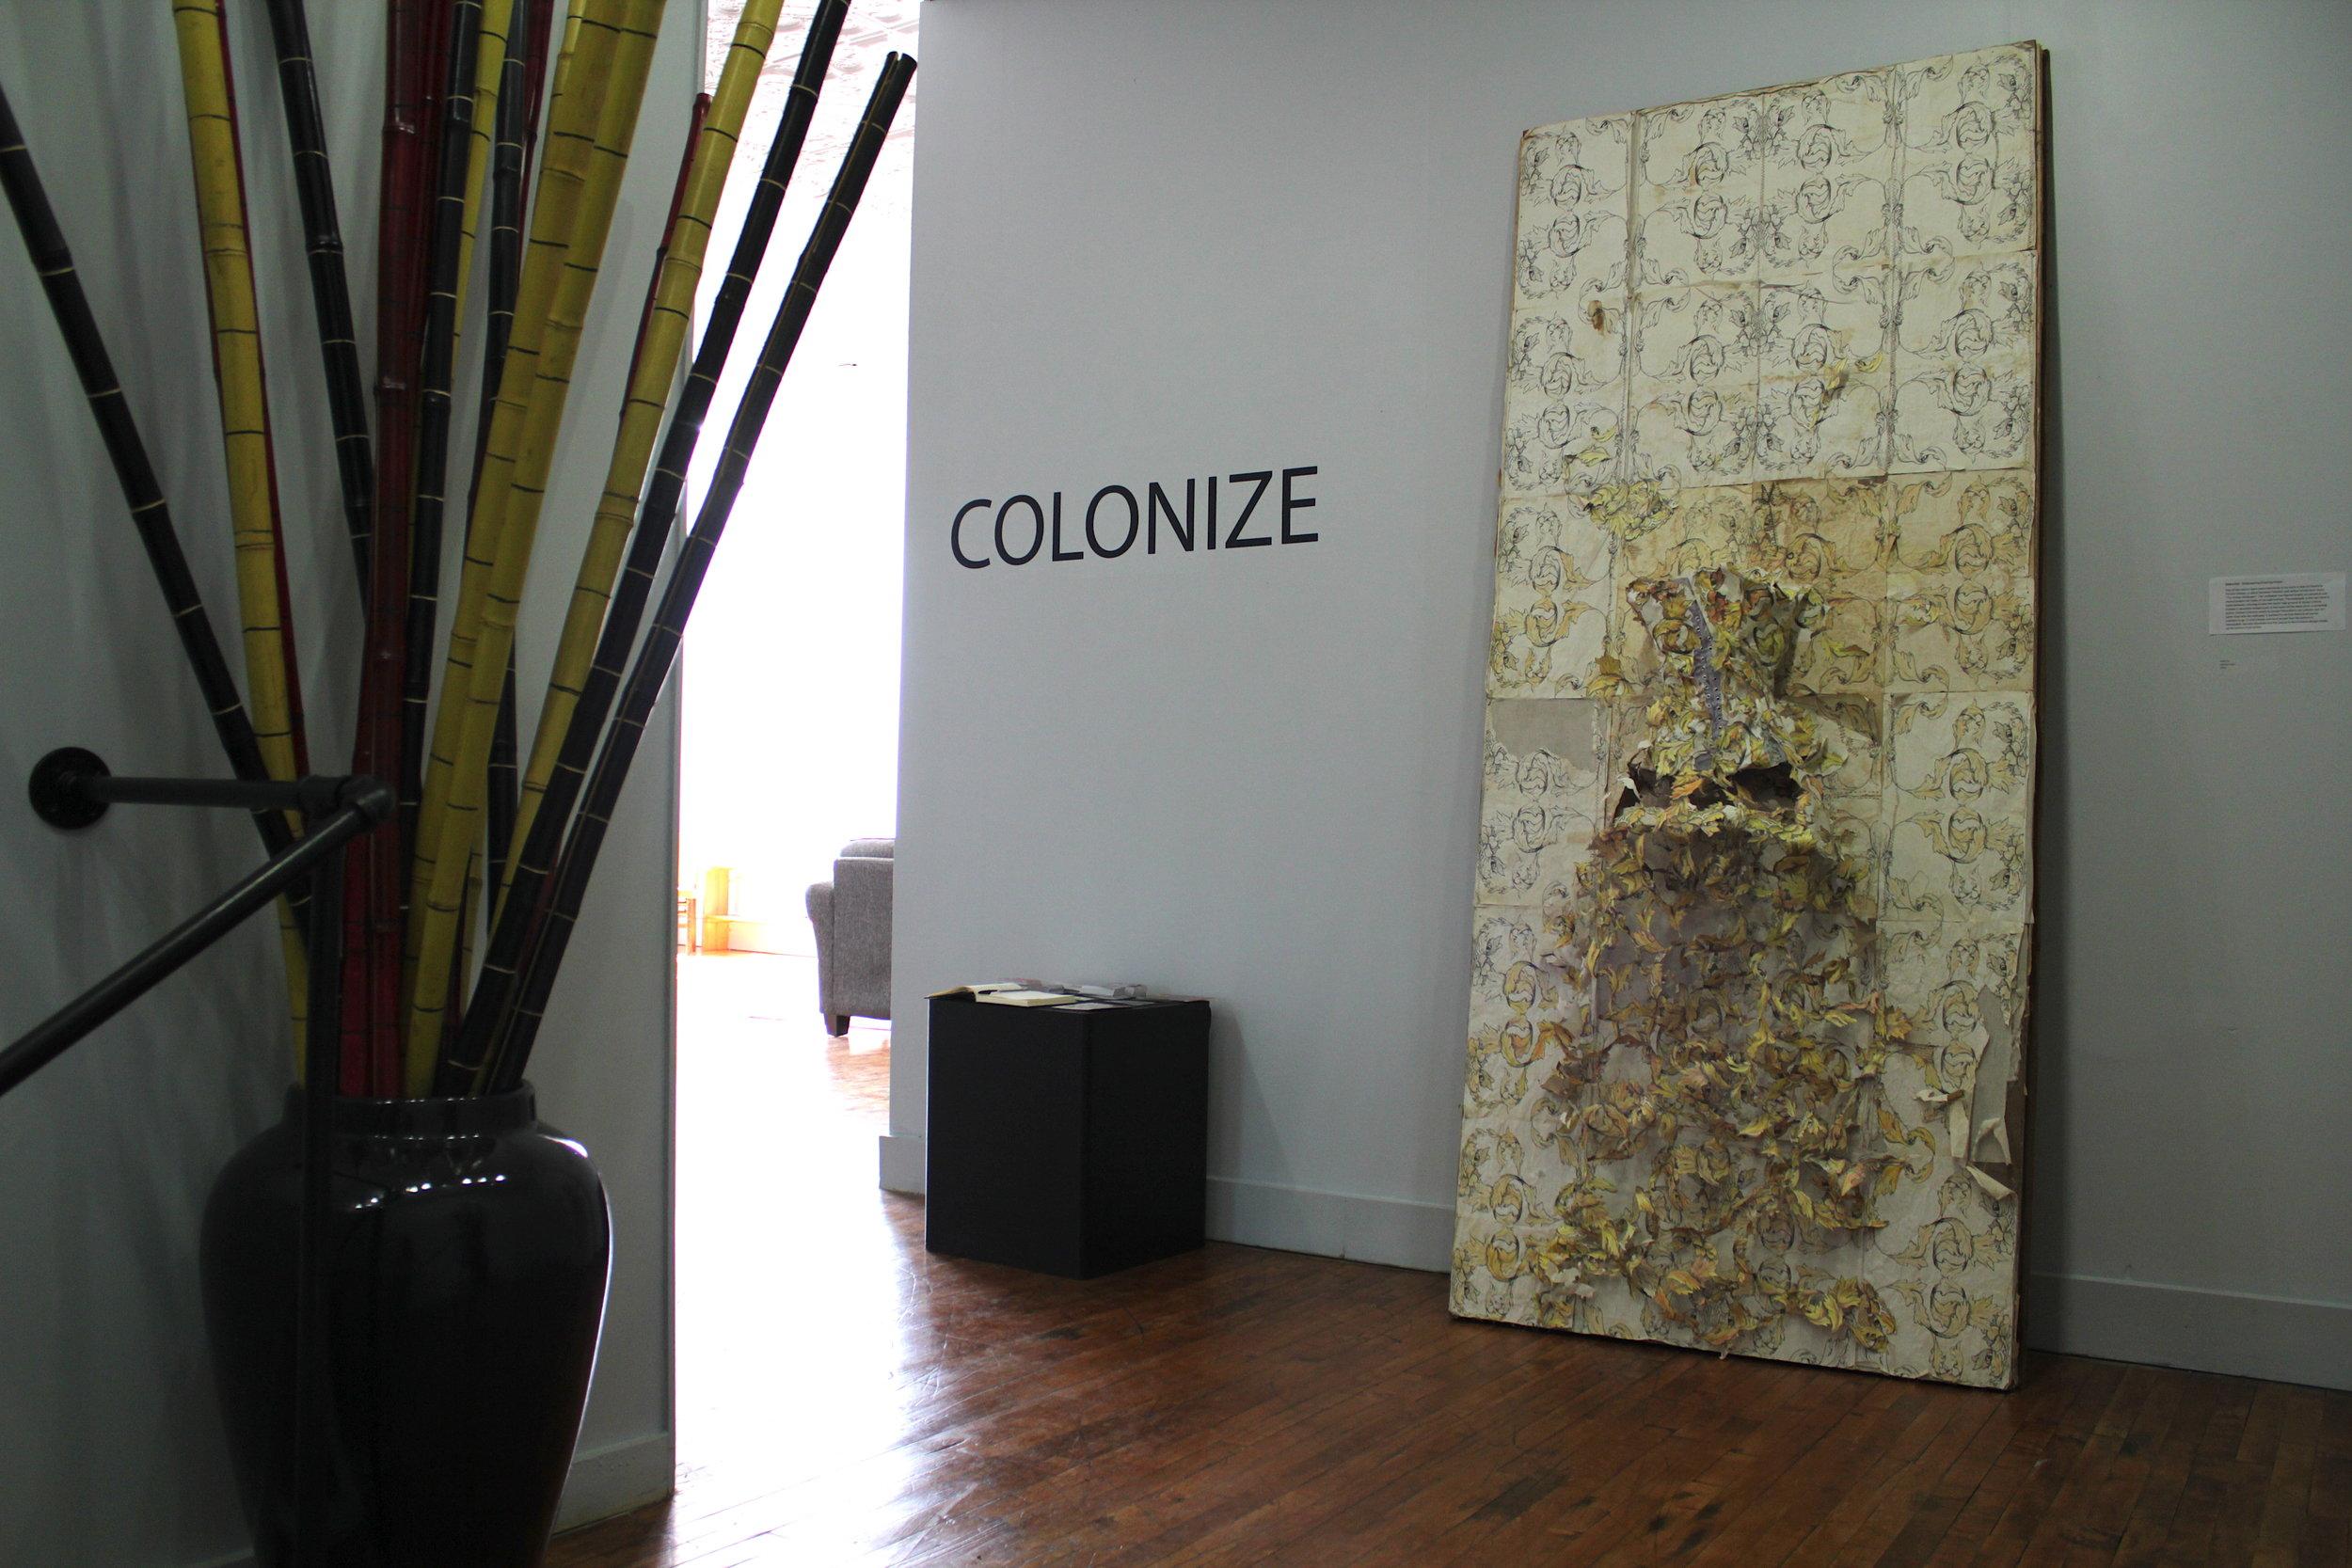 COLONIZE | Jamestown, New York | April 2014